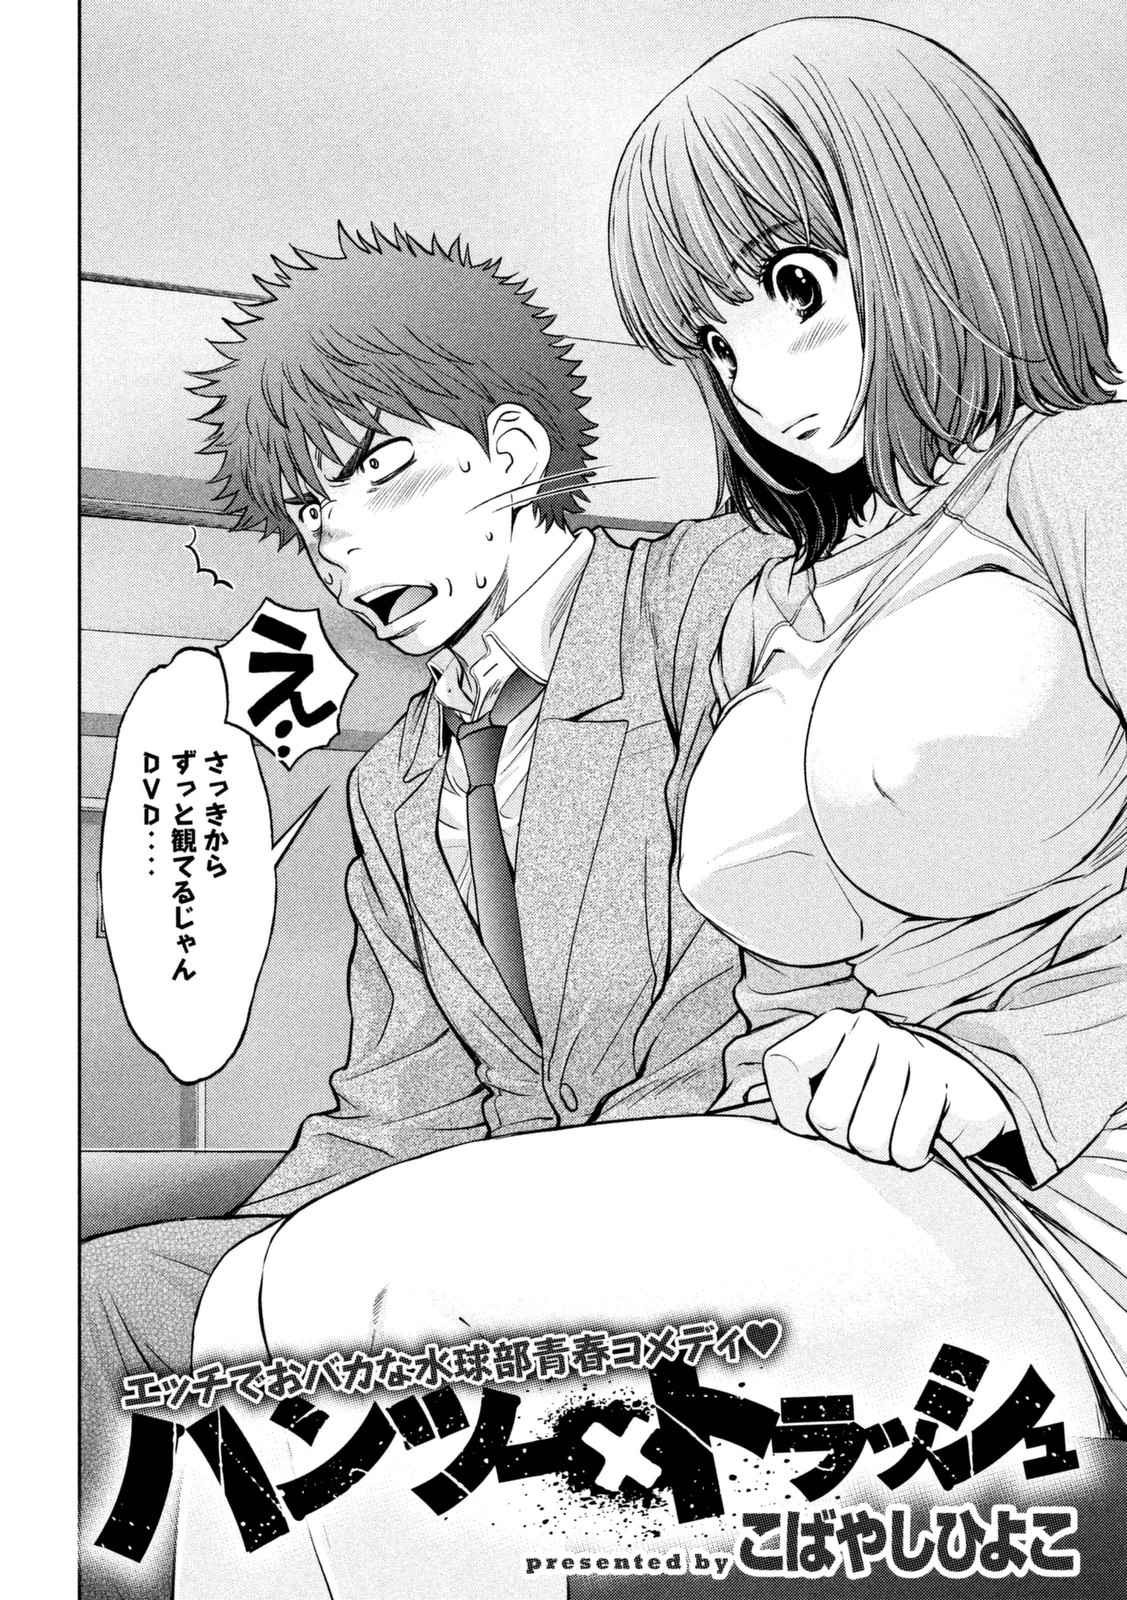 Hantsu x Trash - Chapter 146 - Page 2